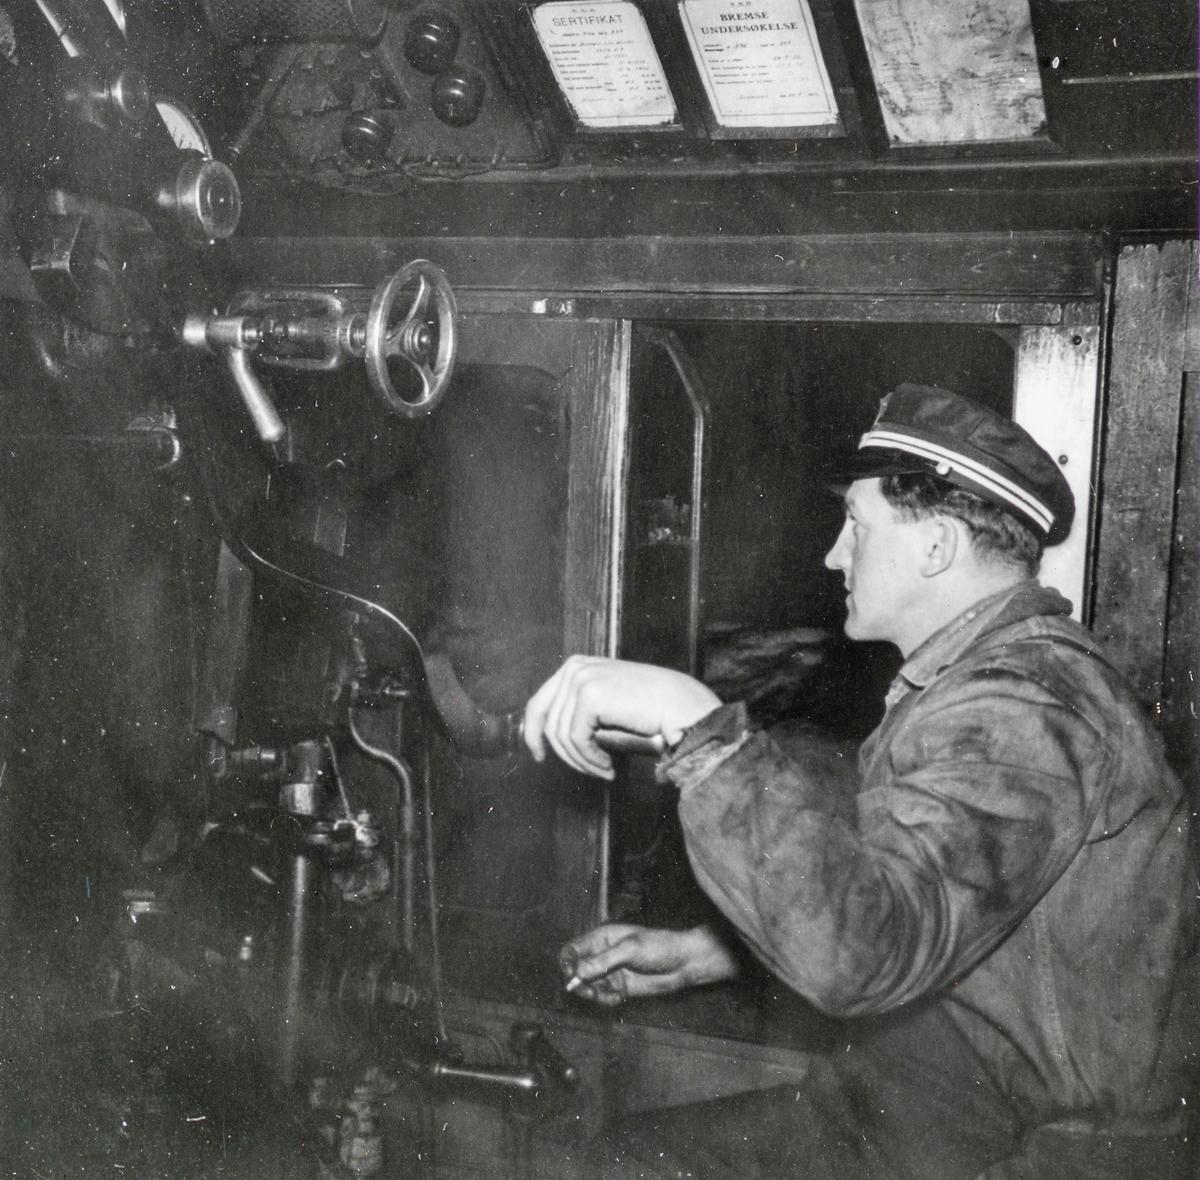 Lokomotivførerens arbeidsplass i damplokomotiv type 33c nr. 396. Snøryddingstjeneste på Saltfjellet.